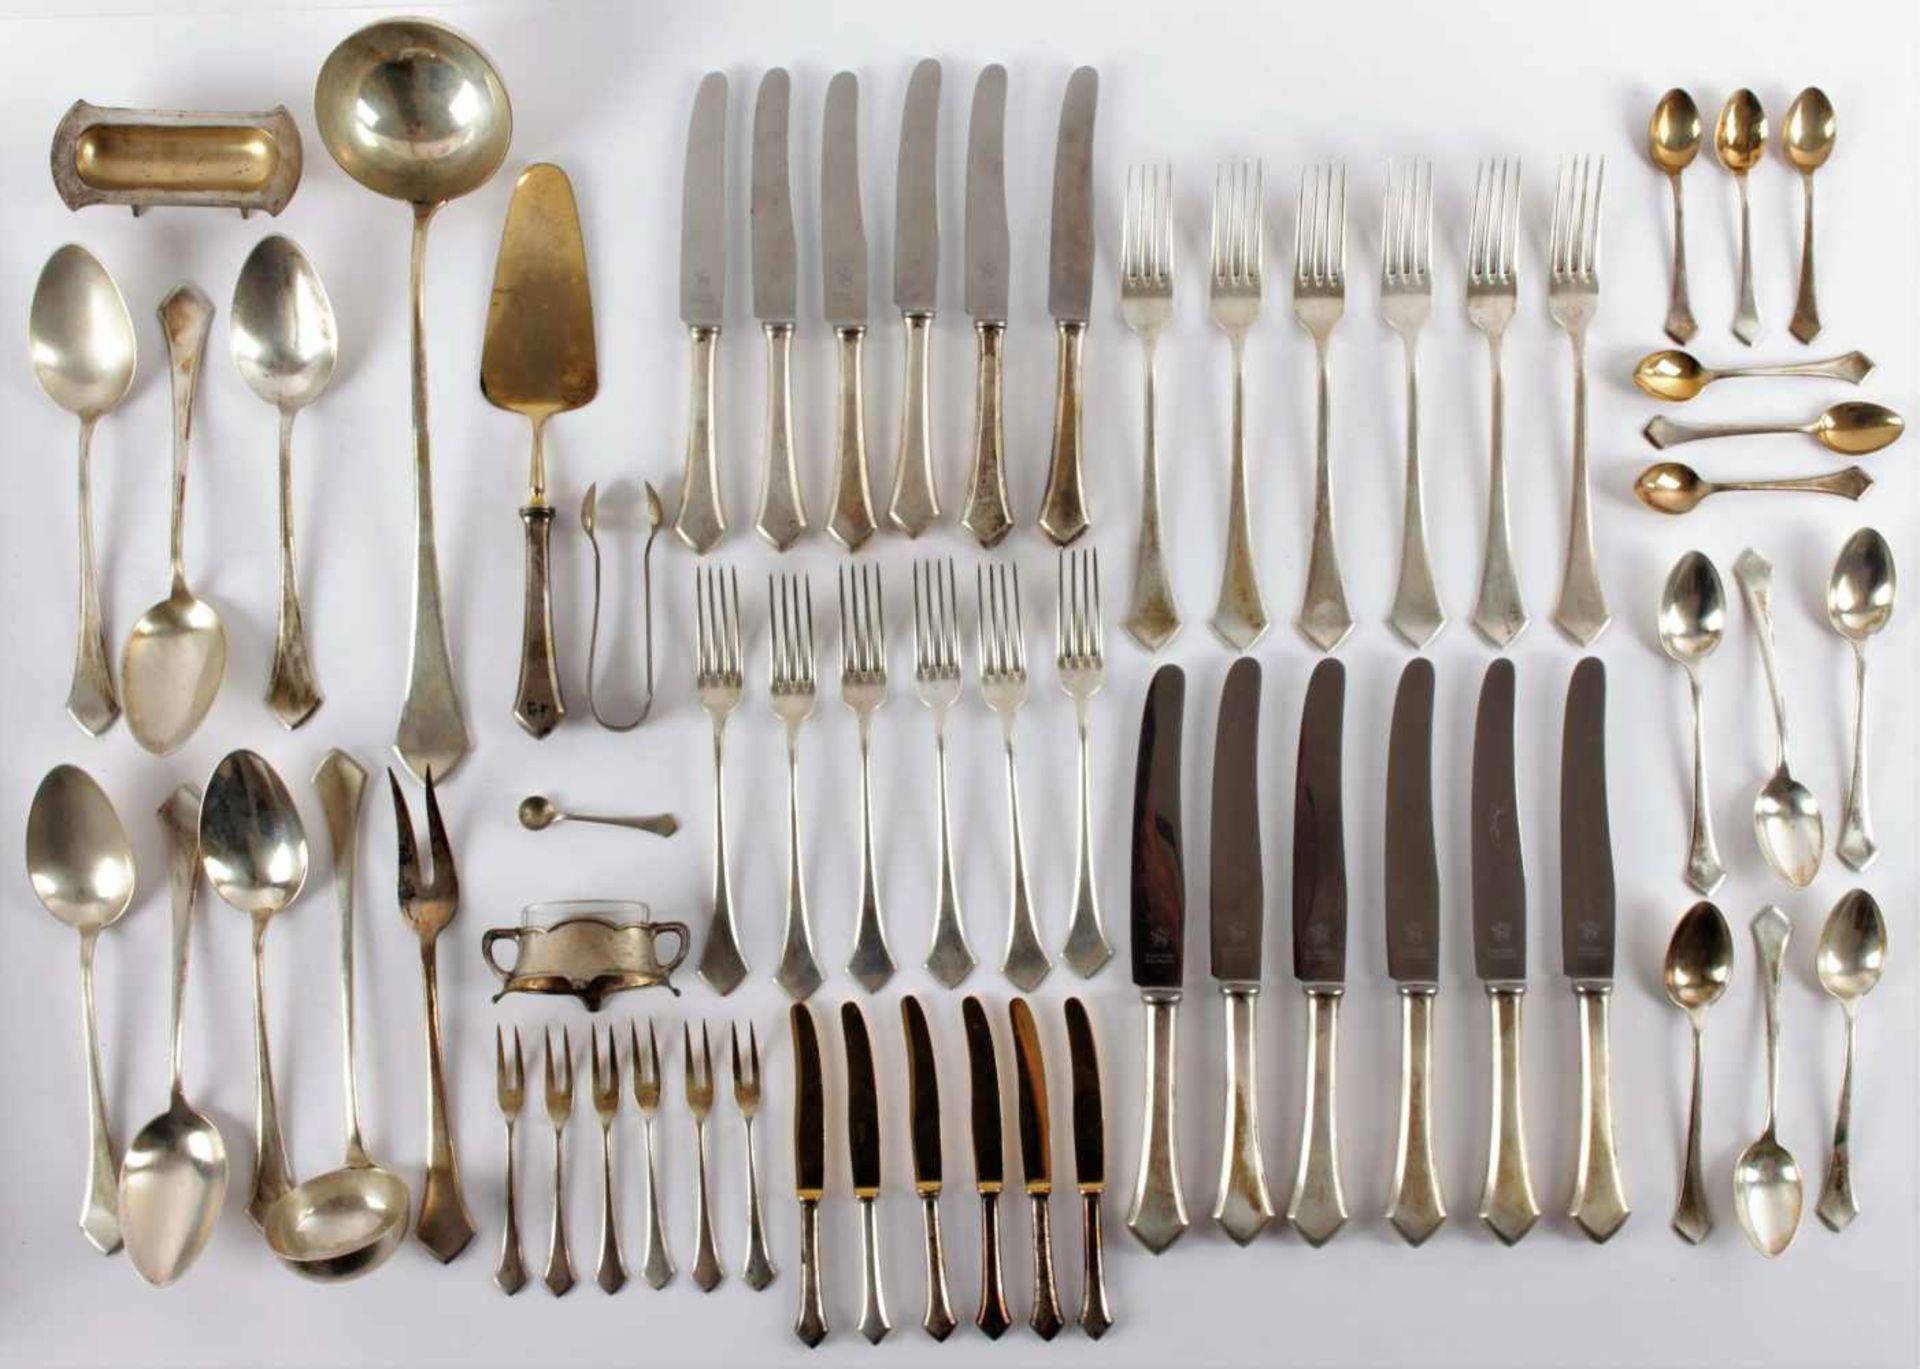 Los 56 - Bibus Frantisek - silver cutlery Czechoslovakia, Moravska Trebova, made by the Bibus firm, after